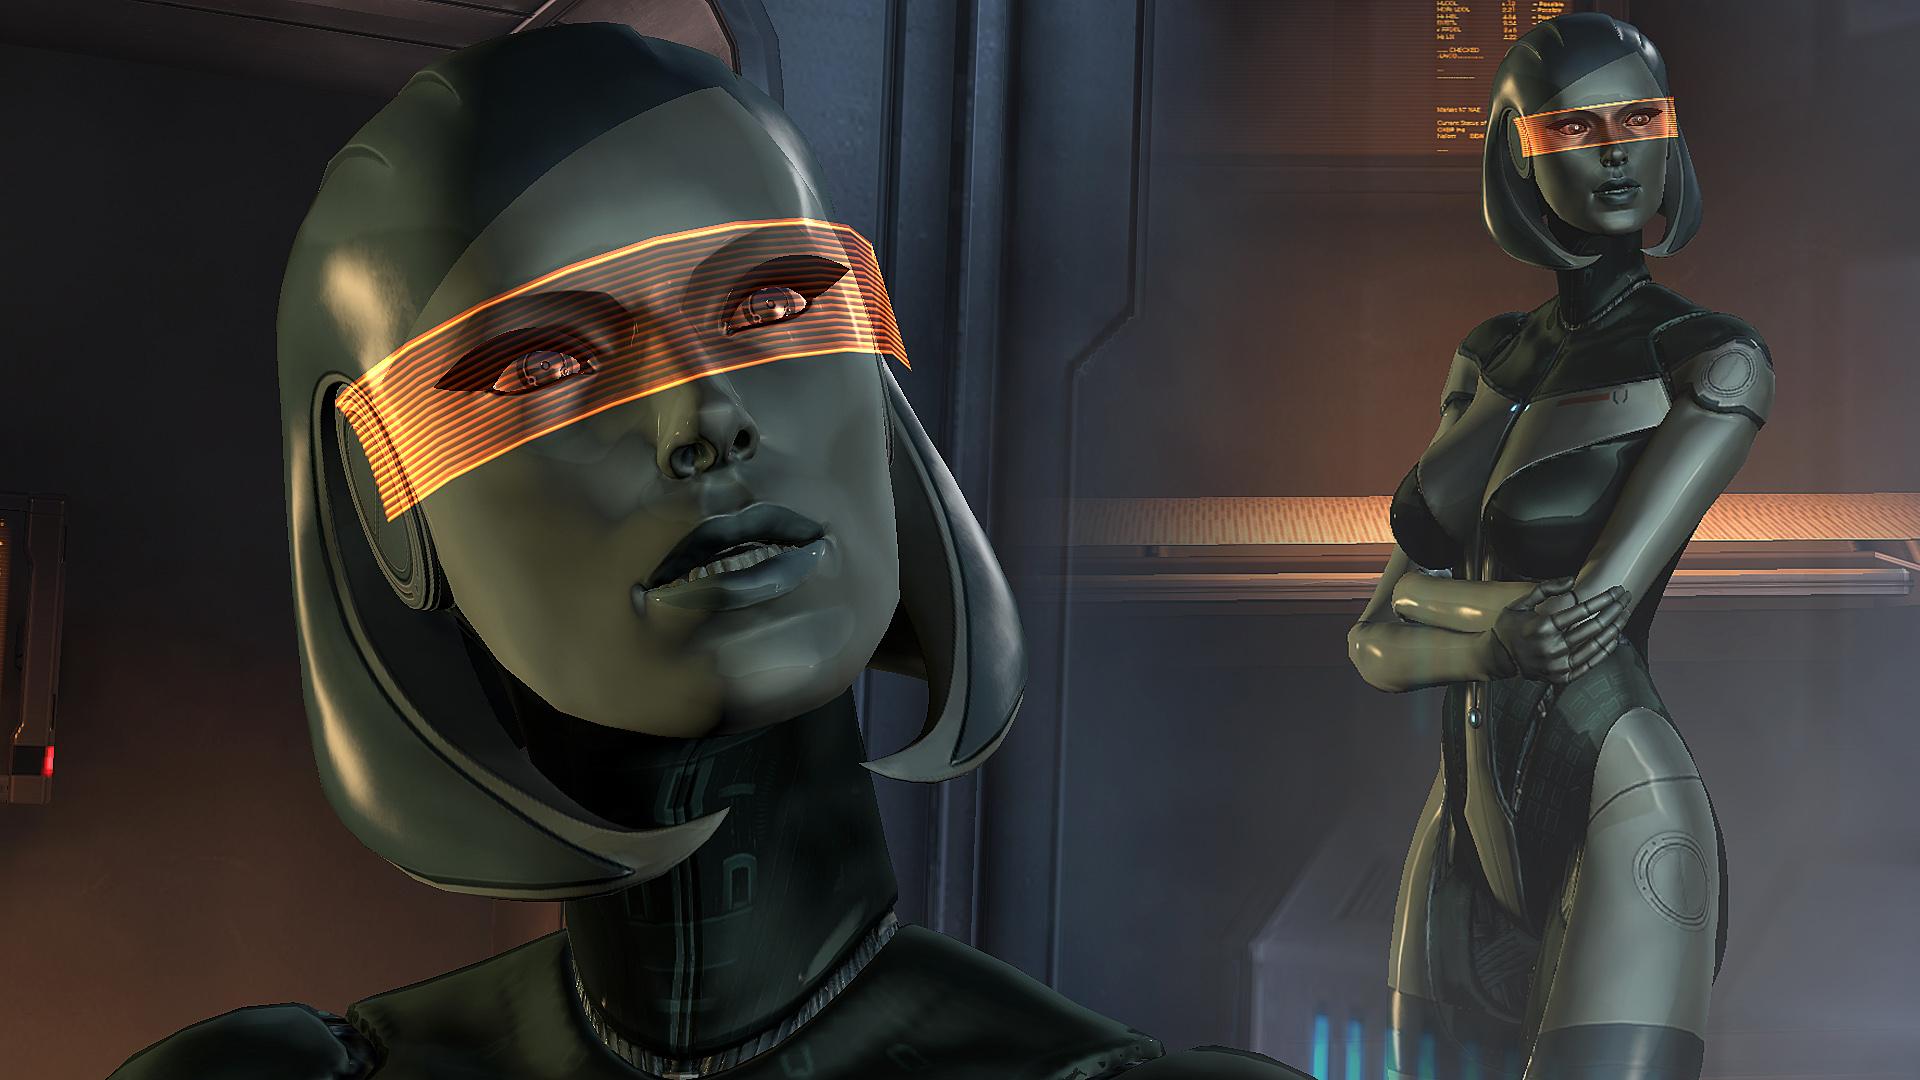 Edi Mass Effect Wallpaper - Resolution:1920x1080 - ID:797088 - wallha.com